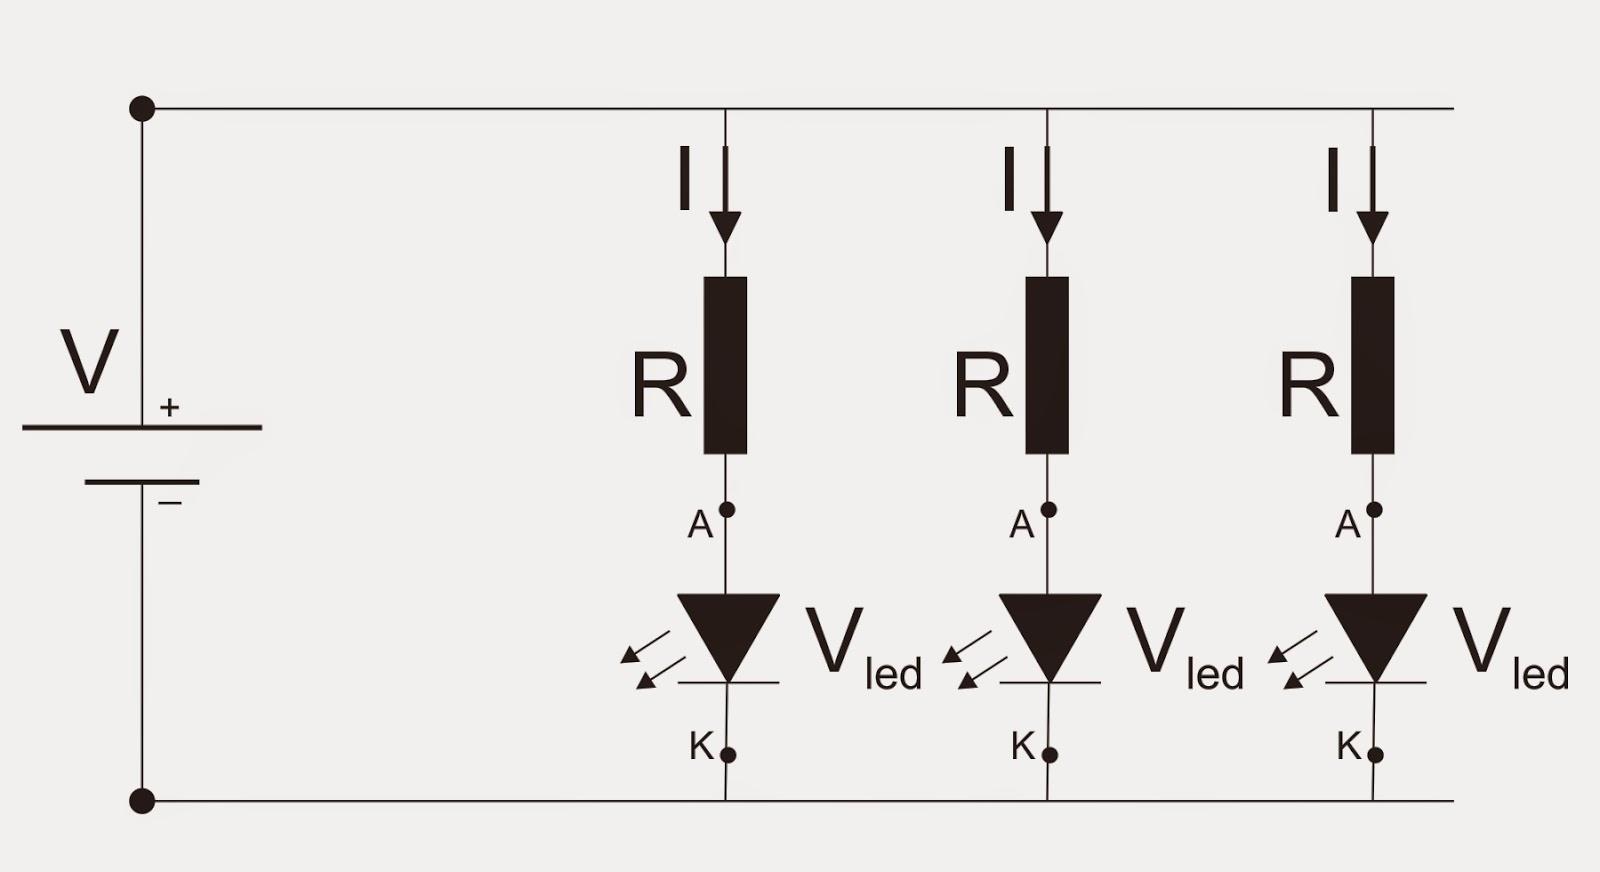 Circuito Paralelo : Maquetas modelos calculo de resistencias para circuitos con led